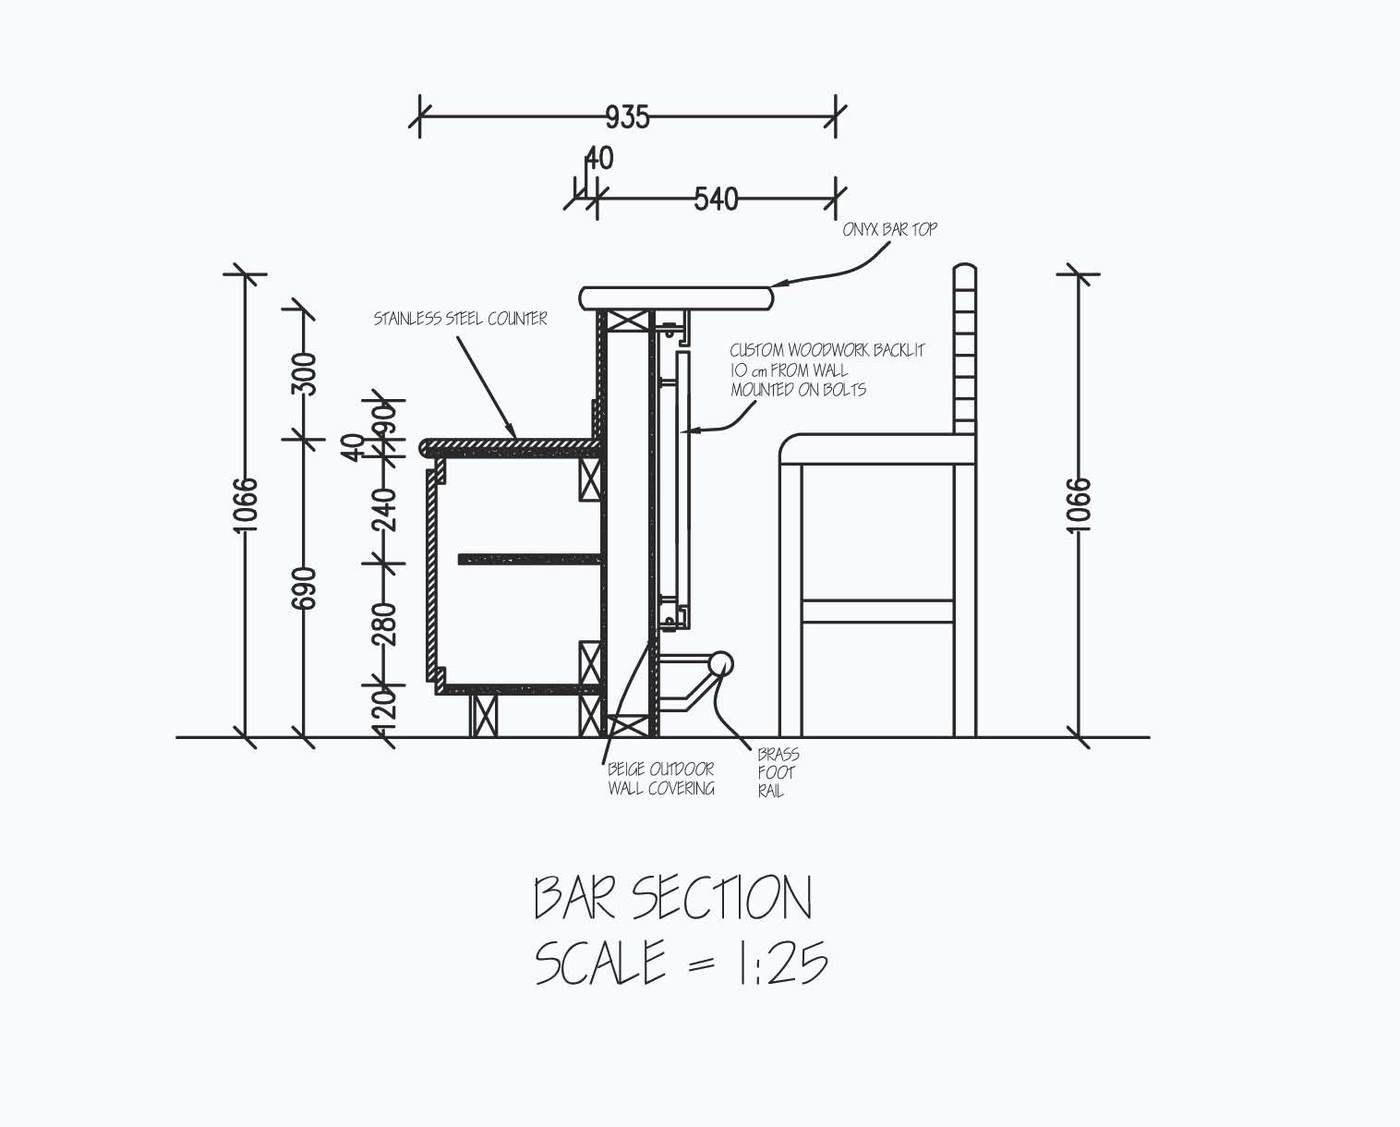 Floor Plans & Detail Drawings by Tony Conetta at Coroflot.com